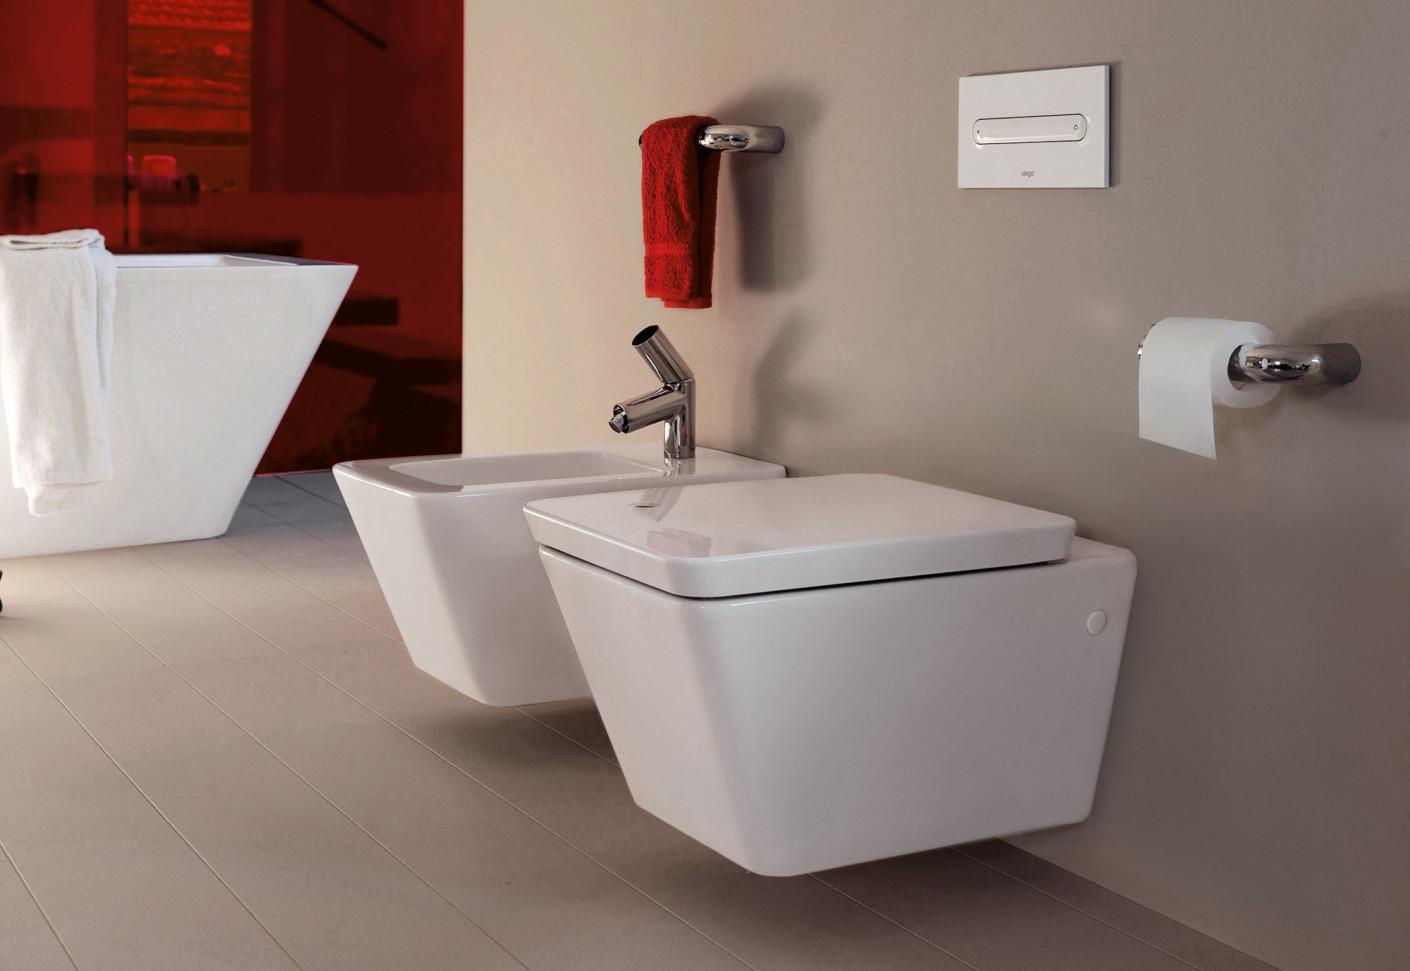 Design bagno bidet : Il Bagno Alessi dOt wallhung bidet by Laufen | STYLEPARK